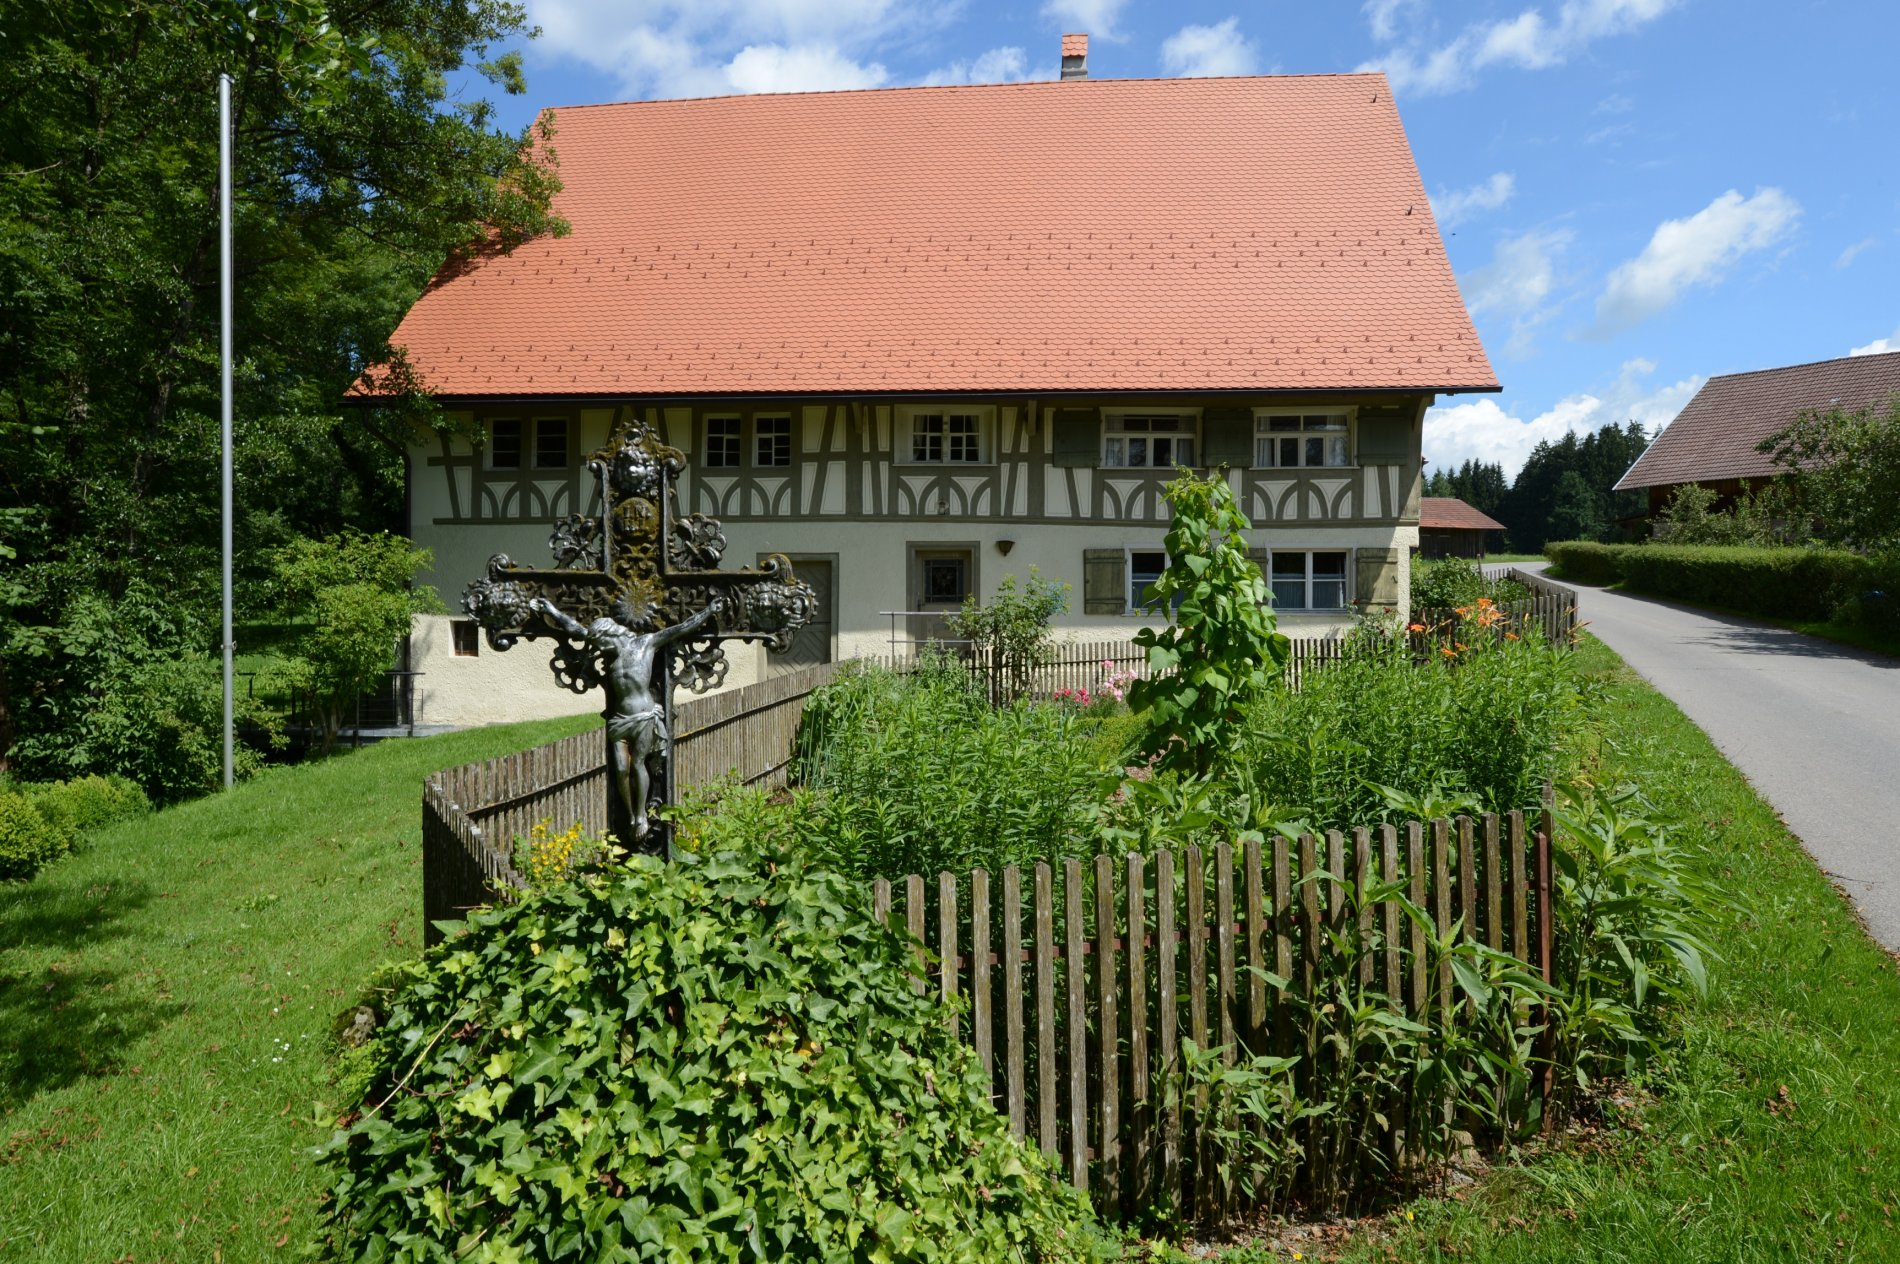 Reibeisenmühle Amtzell